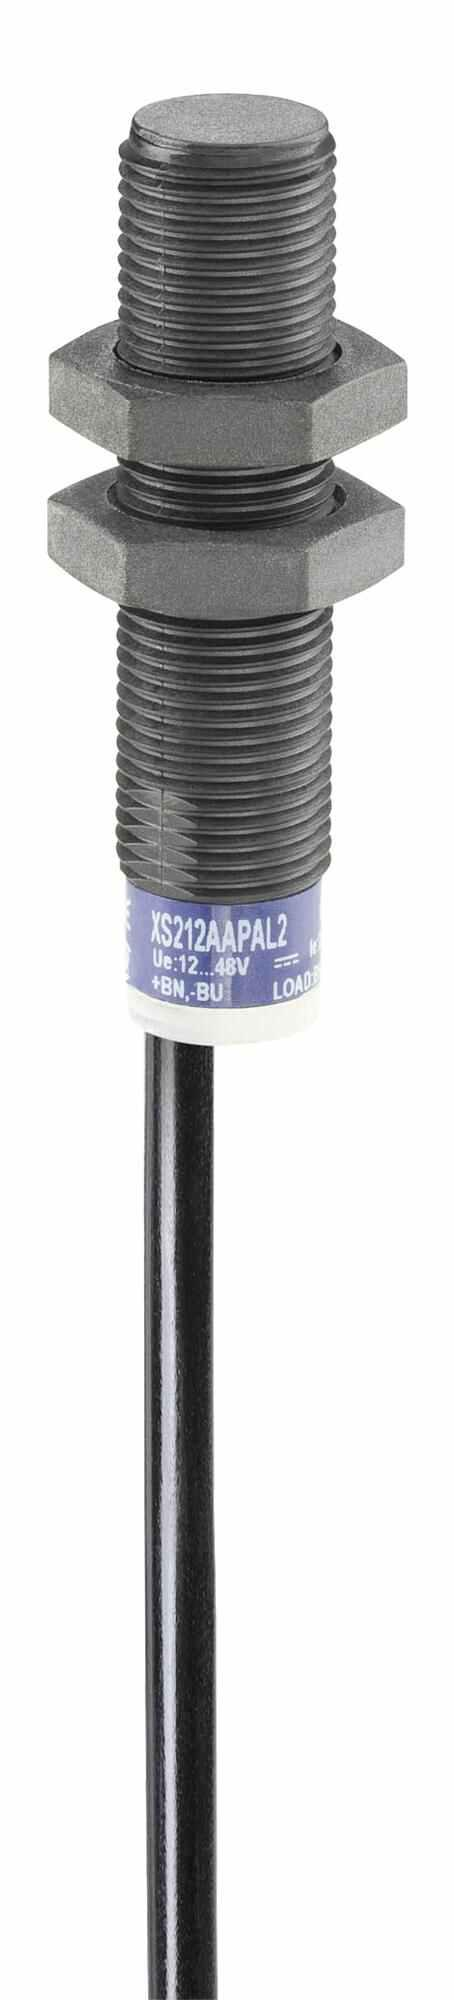 XS212SAPAL2